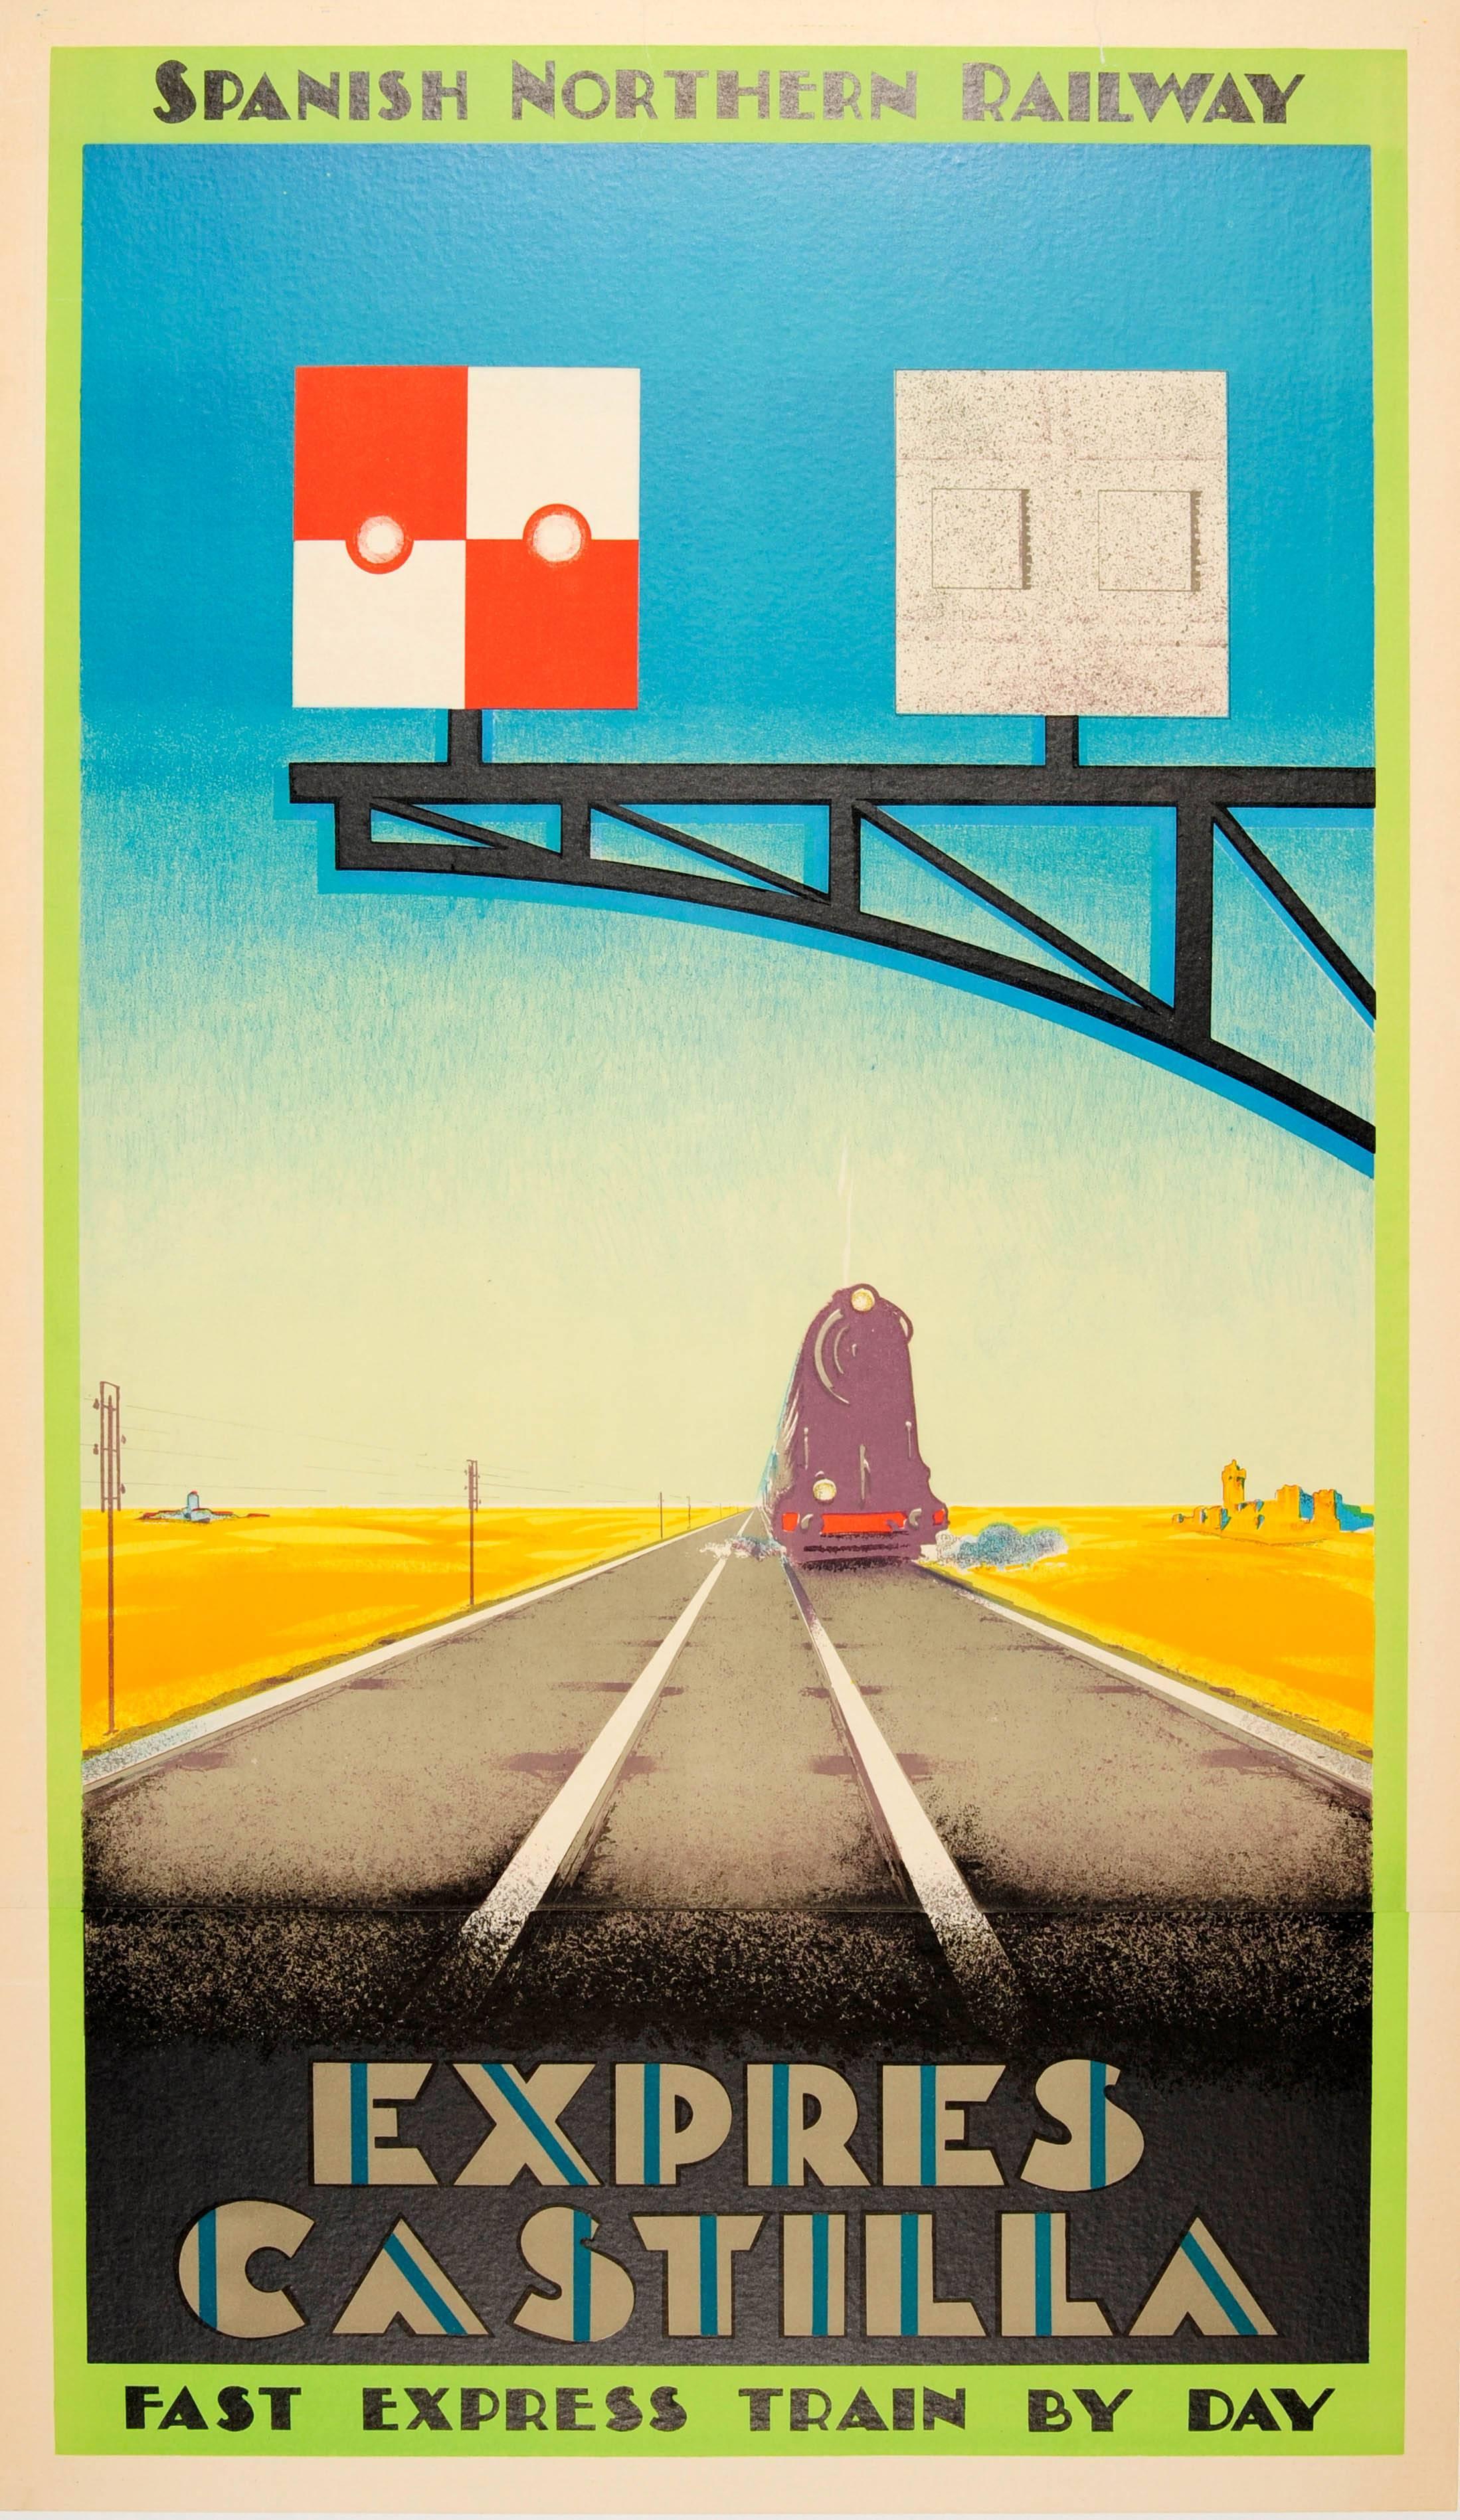 Sunset Cornfield by Dawne Polis 16x16 Poster FARM COUNTRY LANDSCAPE ART PRINT